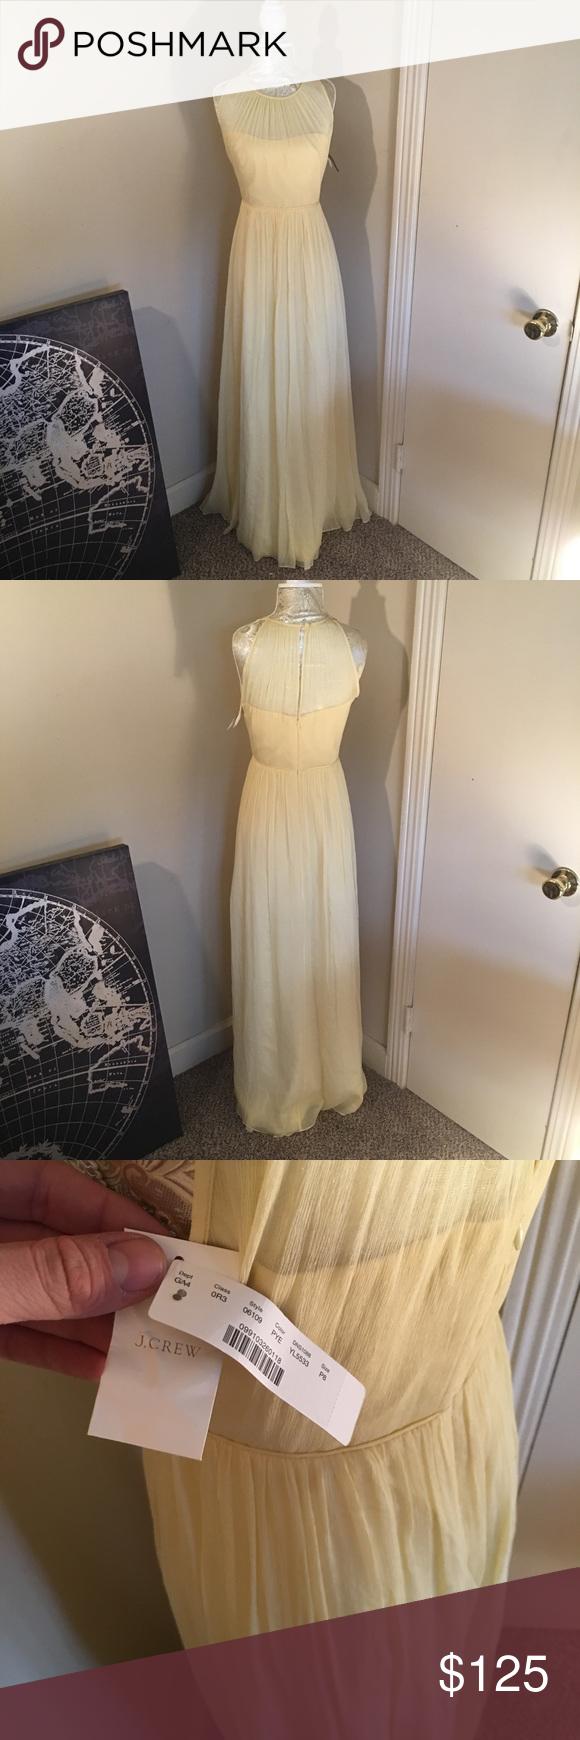 J crew promformal dress nwt my posh picks pinterest daytime